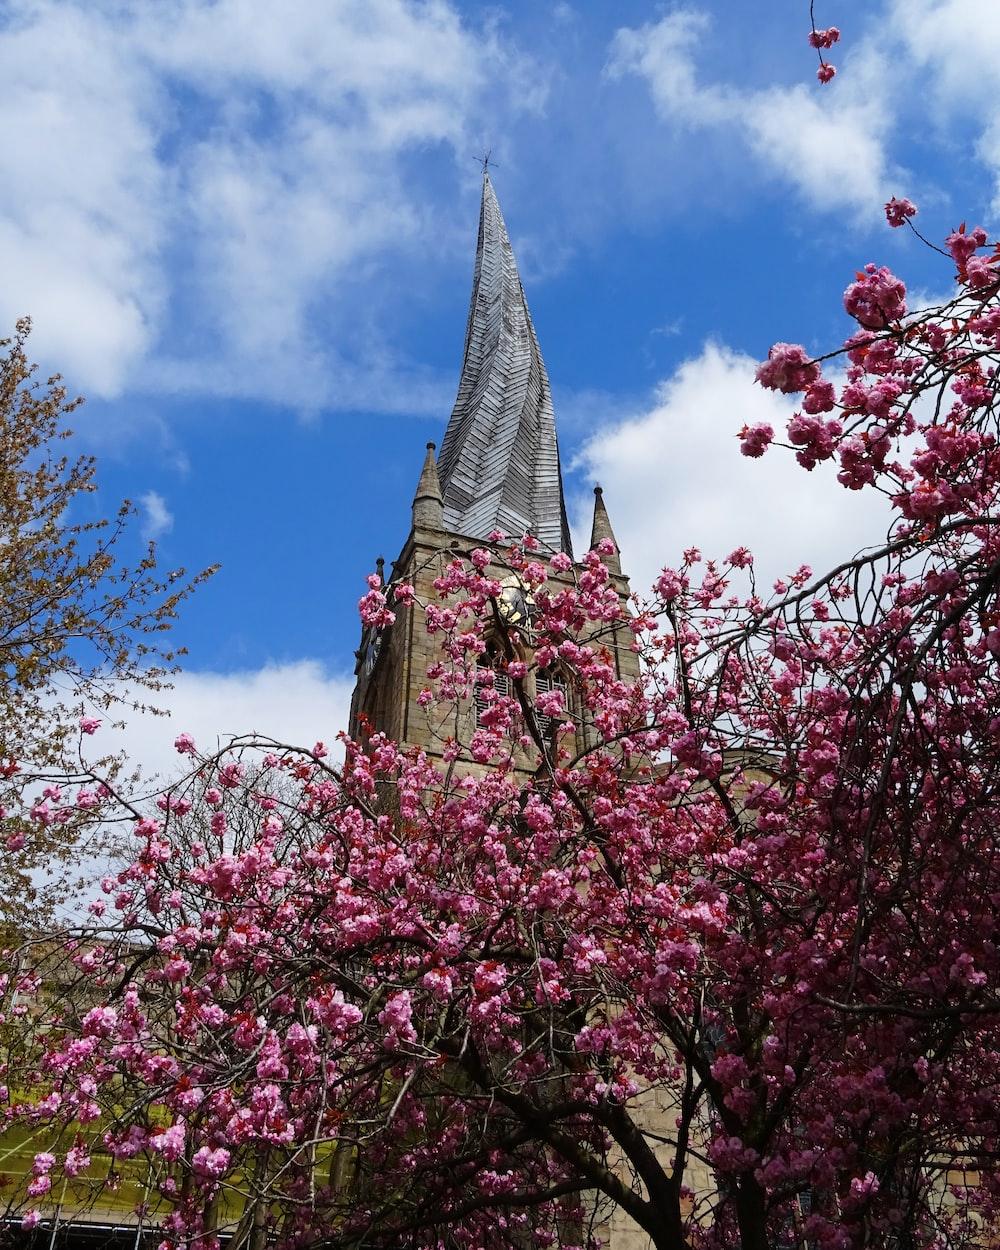 pink cherry blossom tree under blue sky